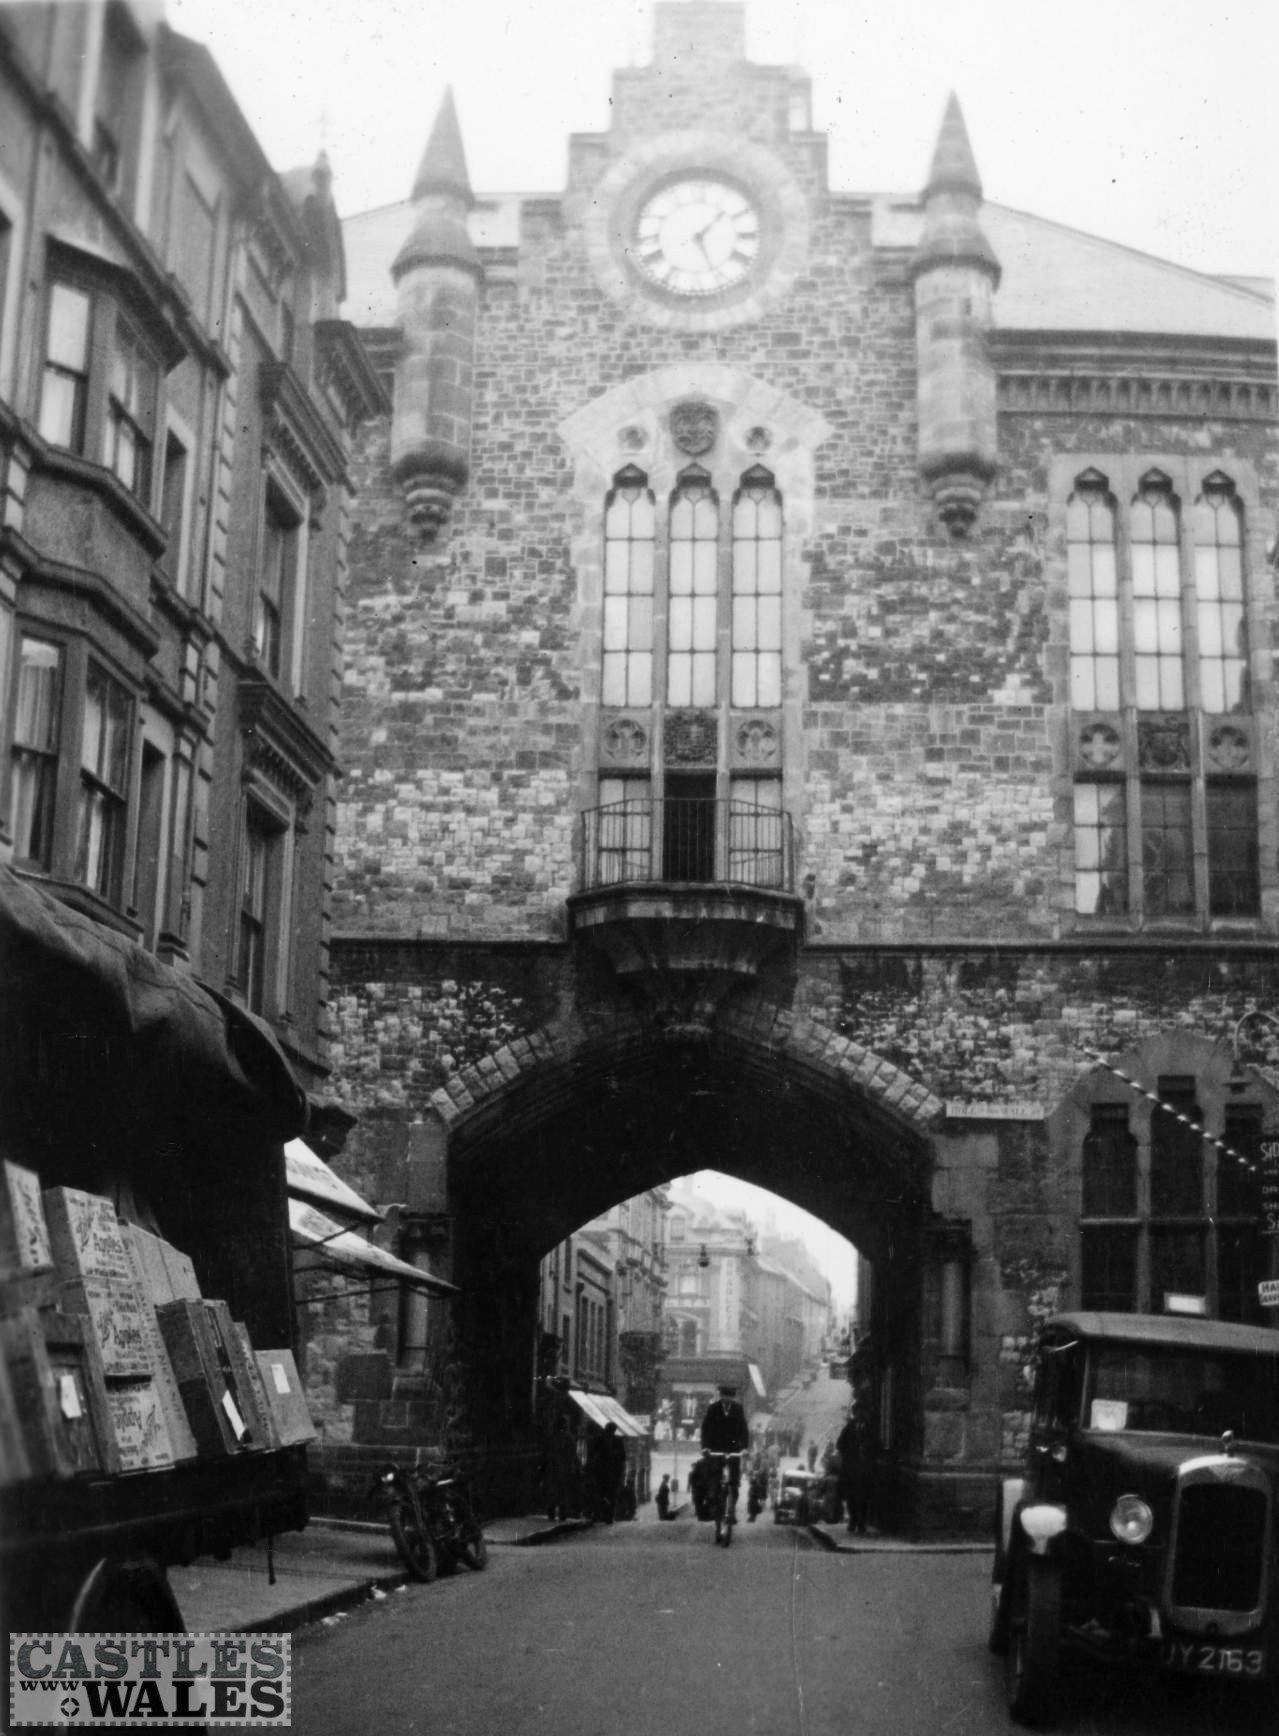 Caernarfon Guildhall in 1935